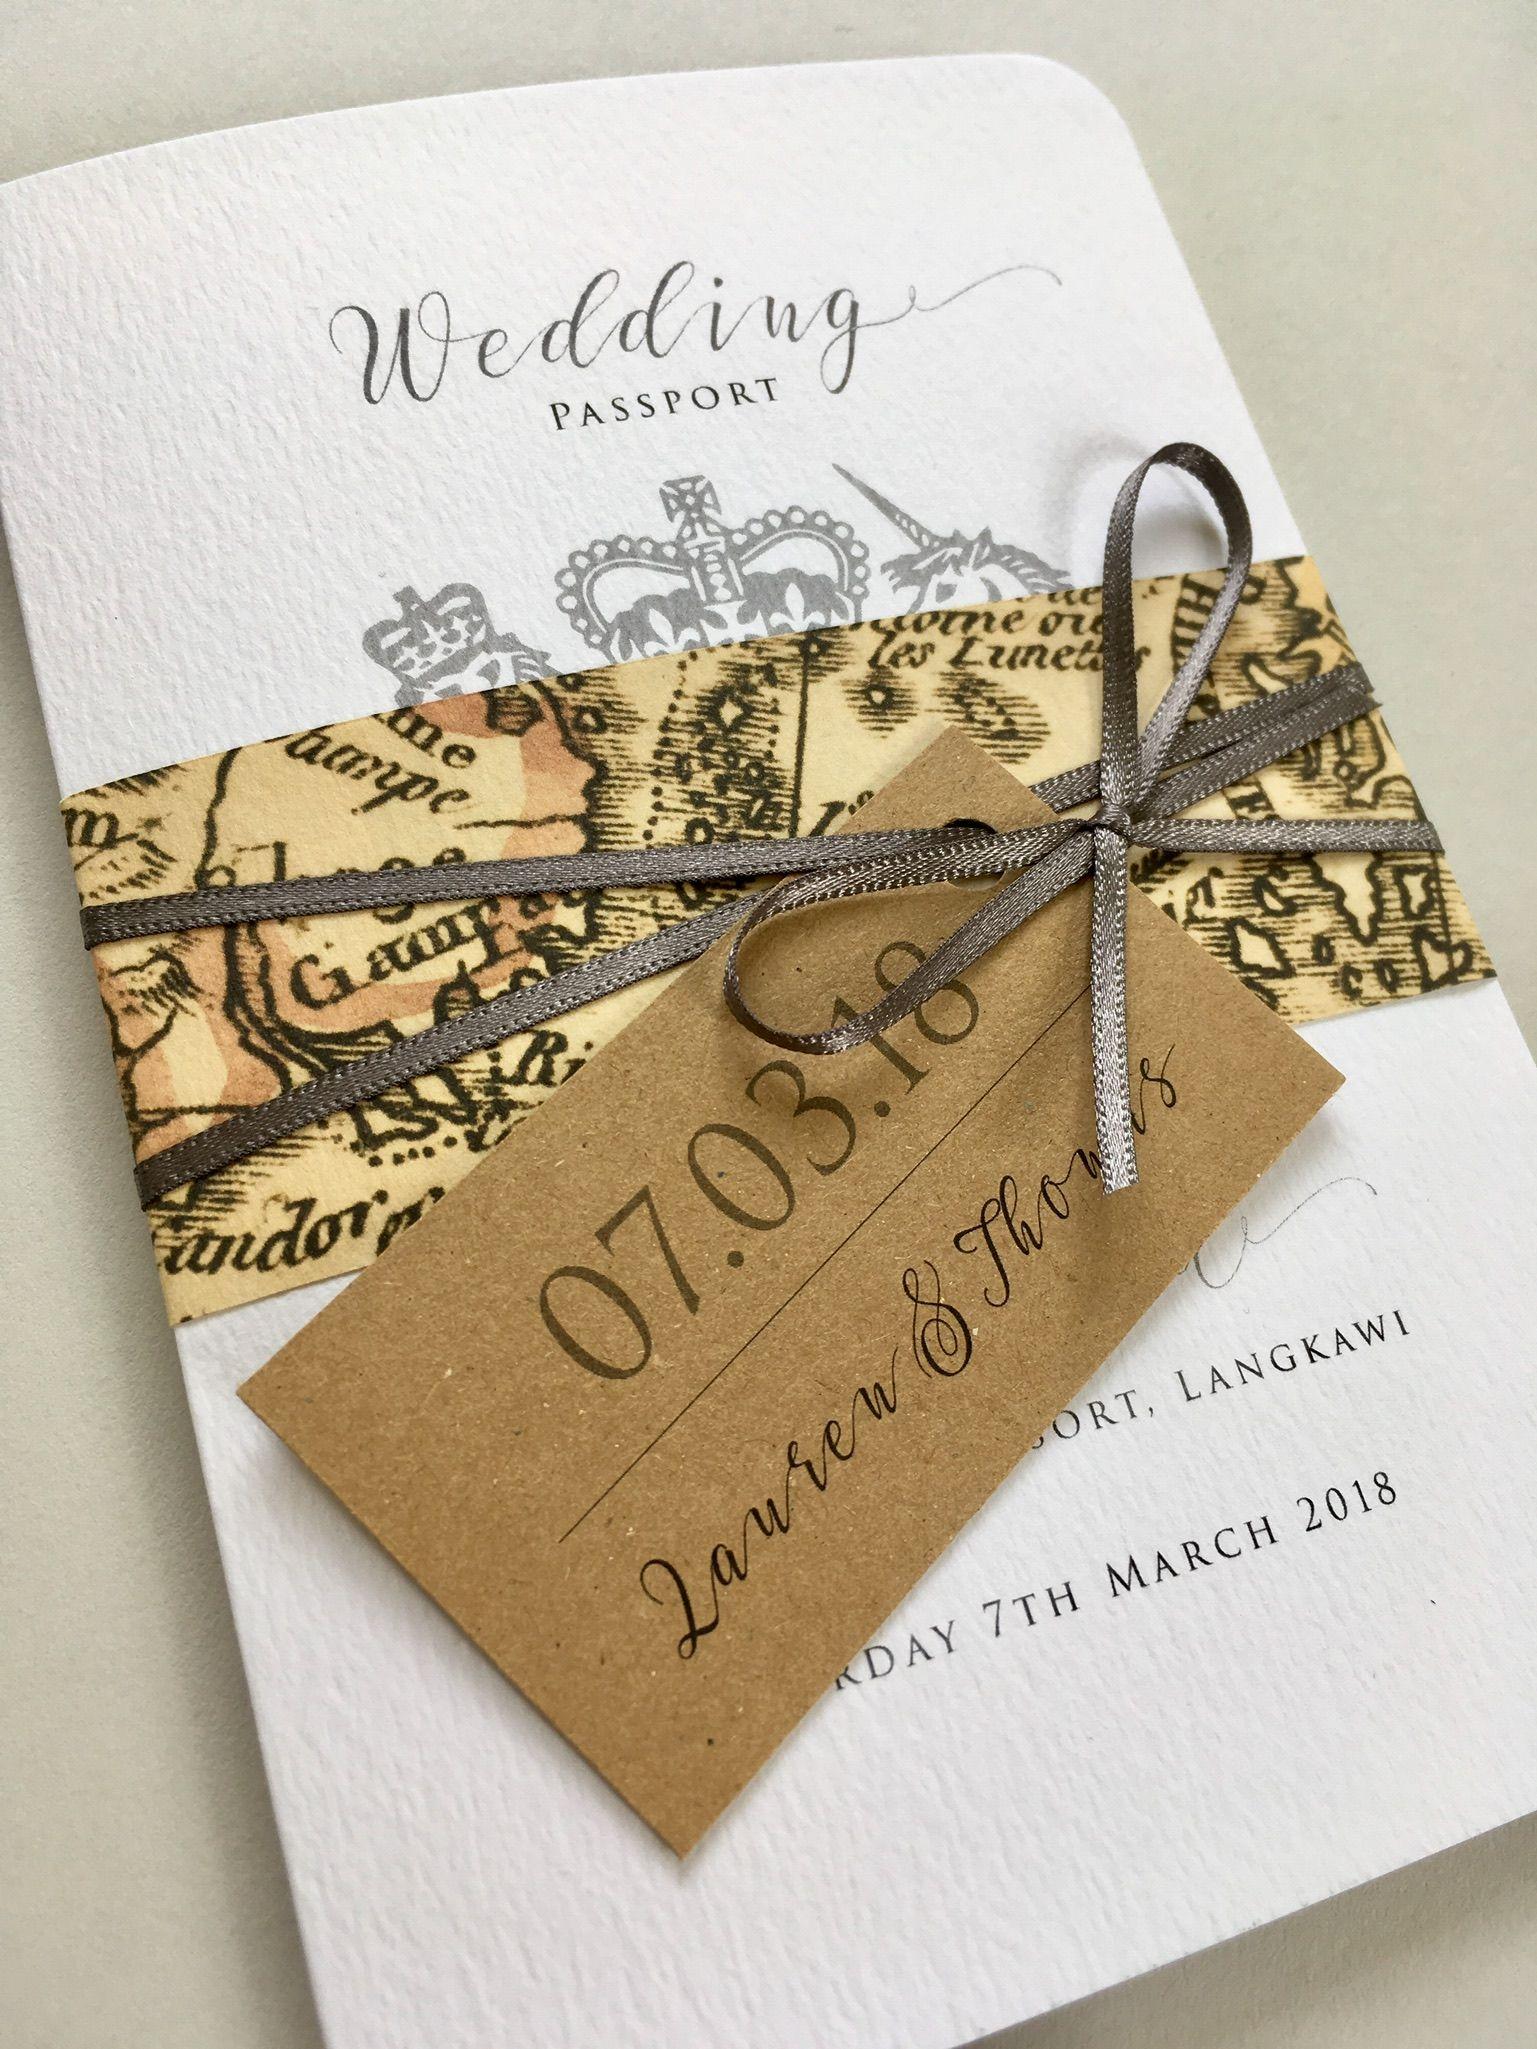 Passport wedding invitation Beautiful wedding stationery lovingly